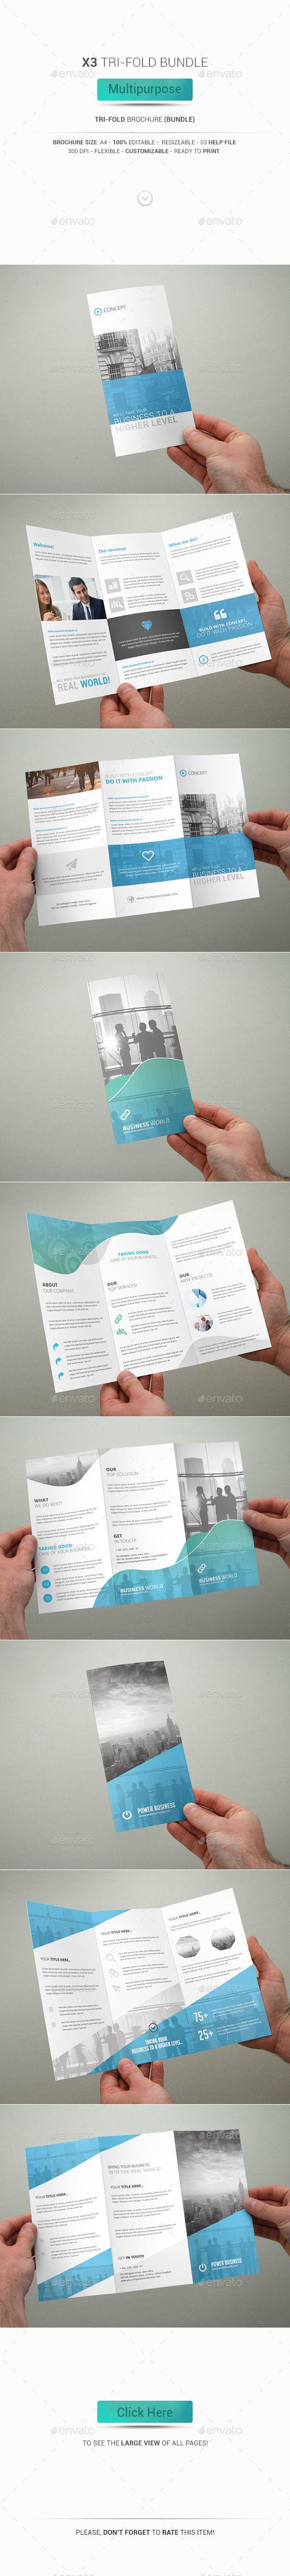 3 Tri-Fold Brochure Bundle - Multipurpose Template #design Download: http://graphicriver.net/item/3-trifold-brochure-bundle-multipurpose/12838668?ref=ksioks